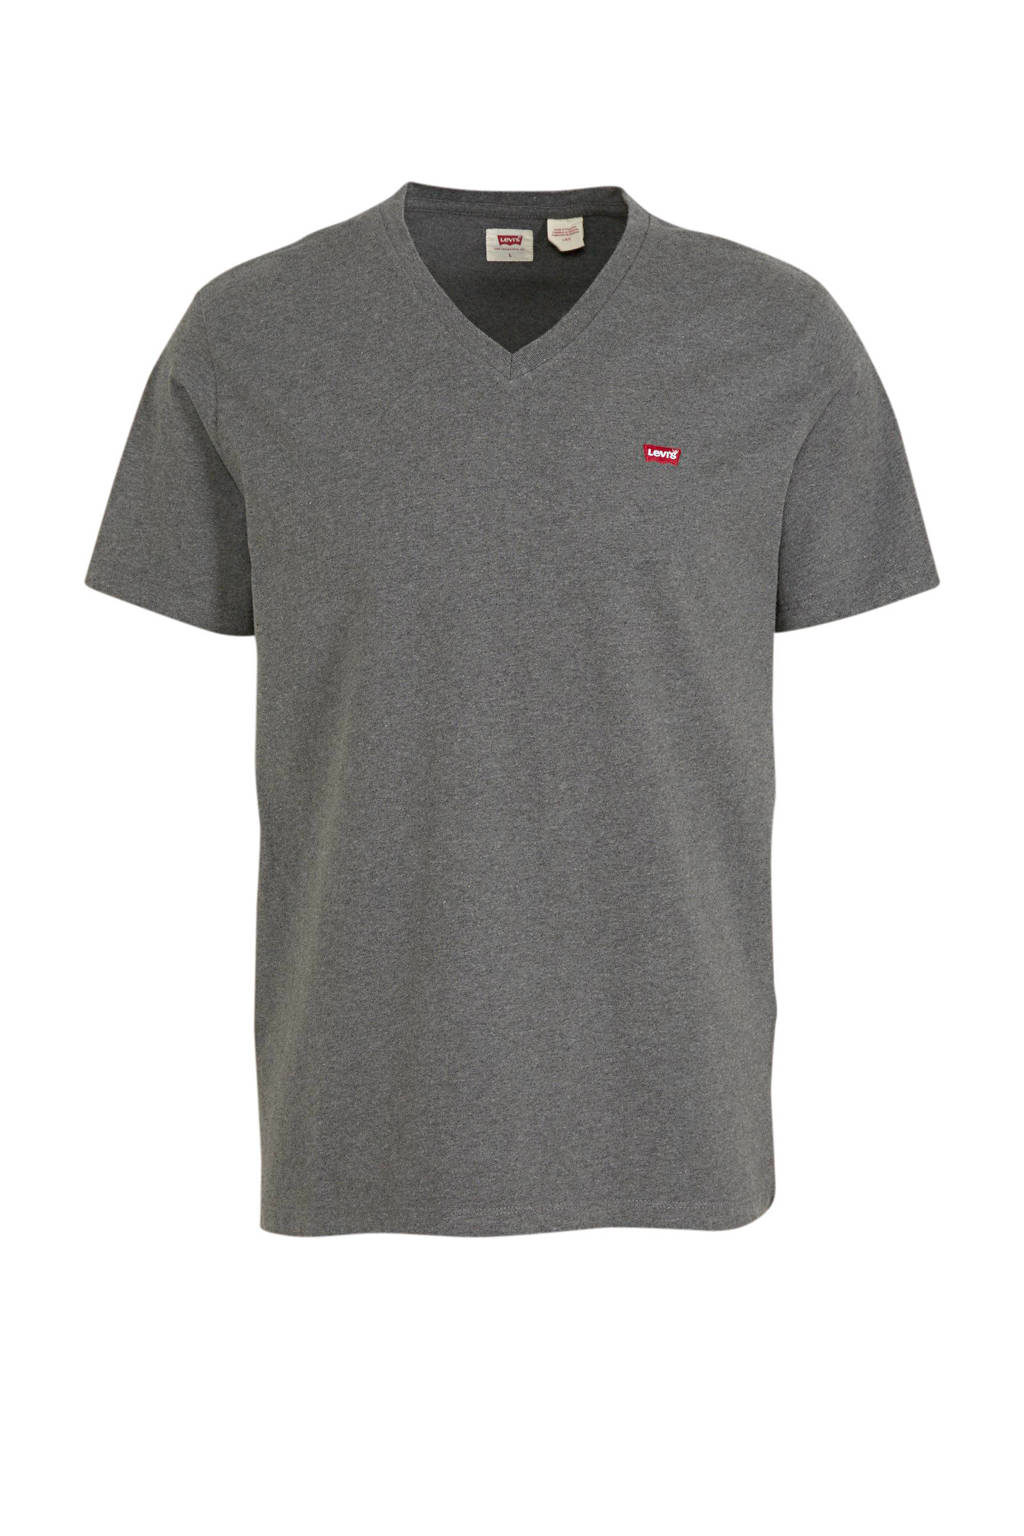 Levi's T-shirt grijs melange, Grijs melange